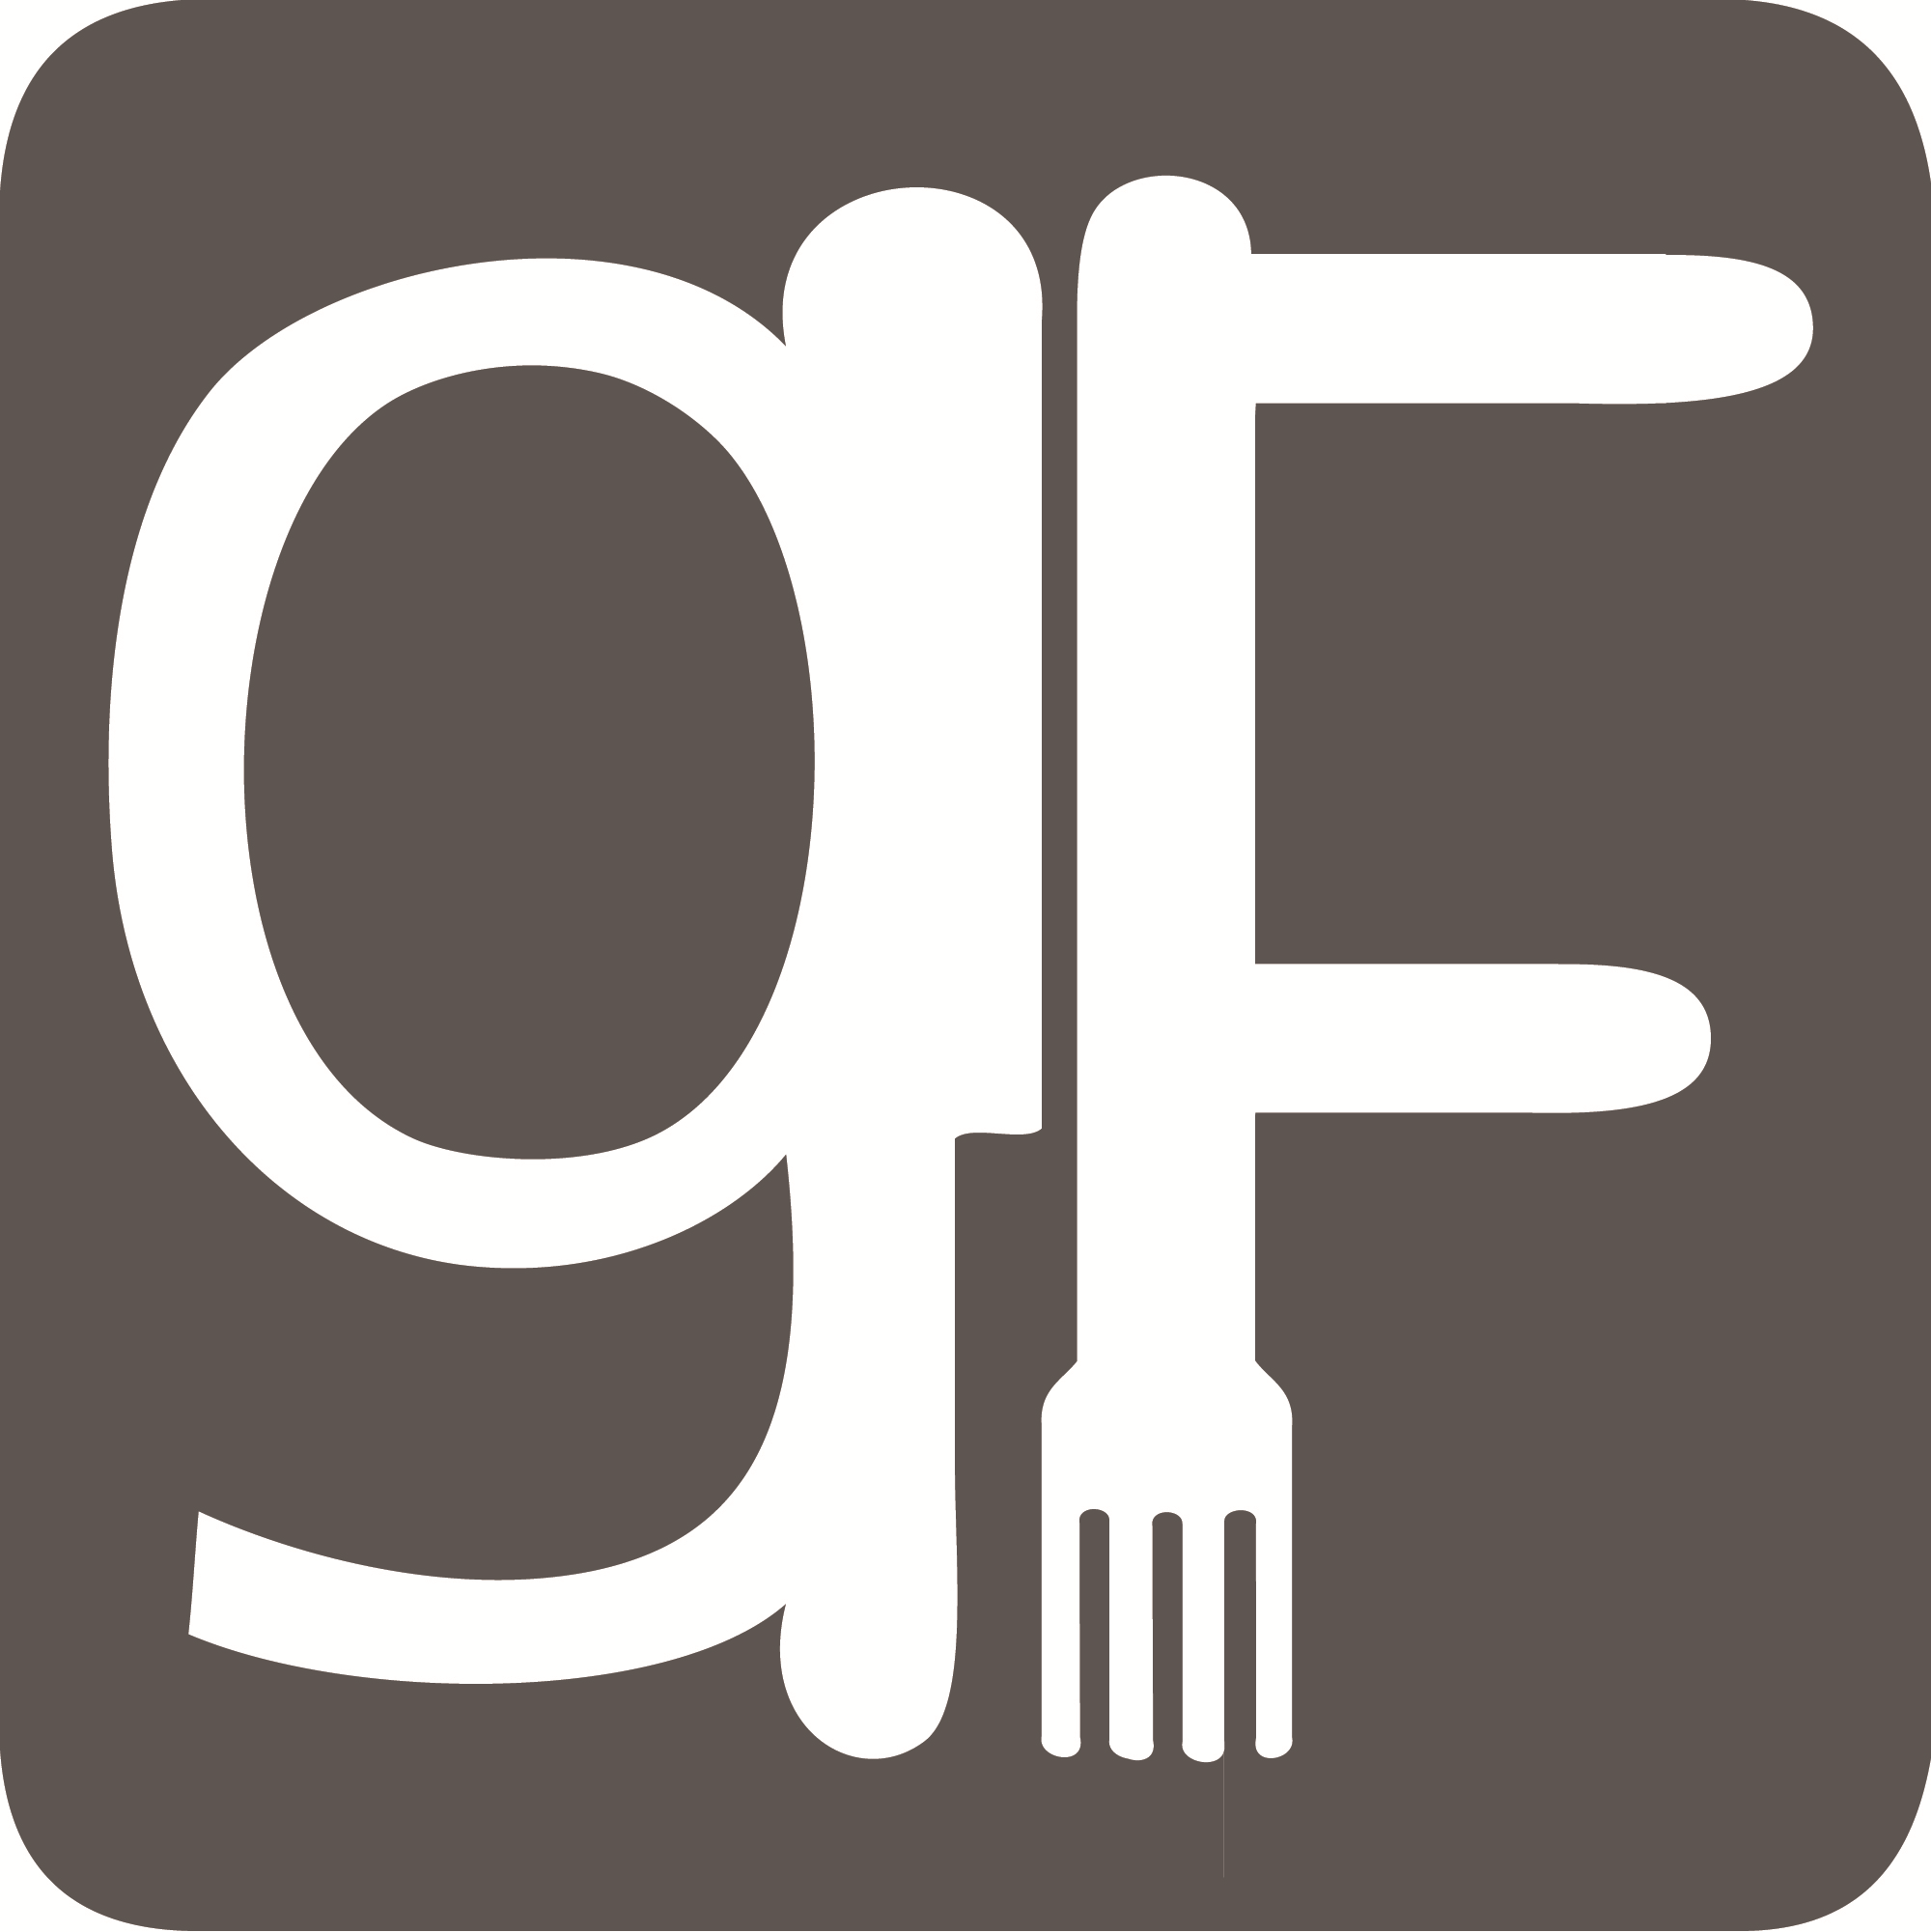 Gf logo england pinterest oxford england dinner options and gf logo express pizzafree symbolsgluten biocorpaavc Gallery